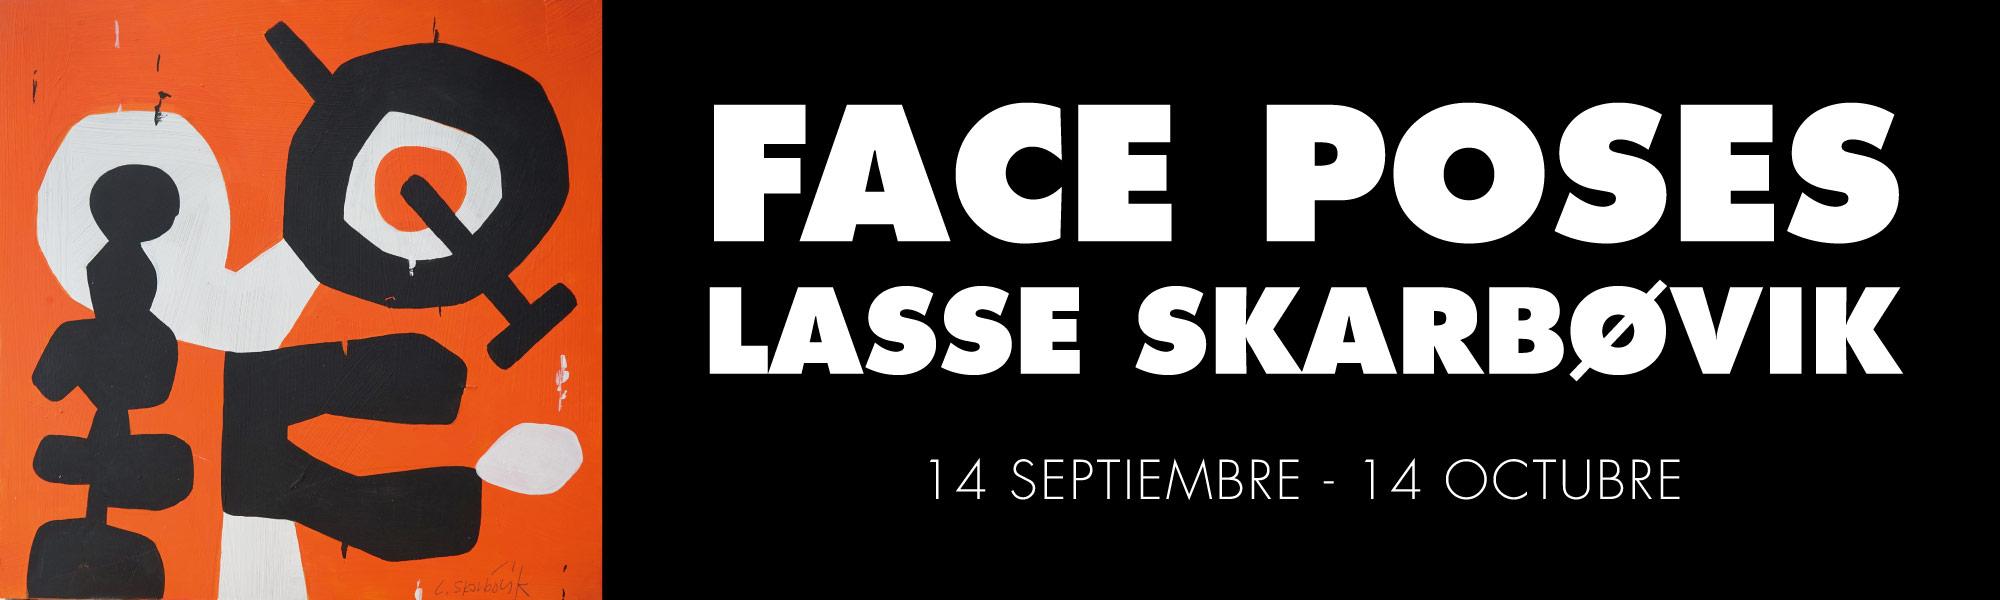 face-poses-lasse-skarbovik-slide